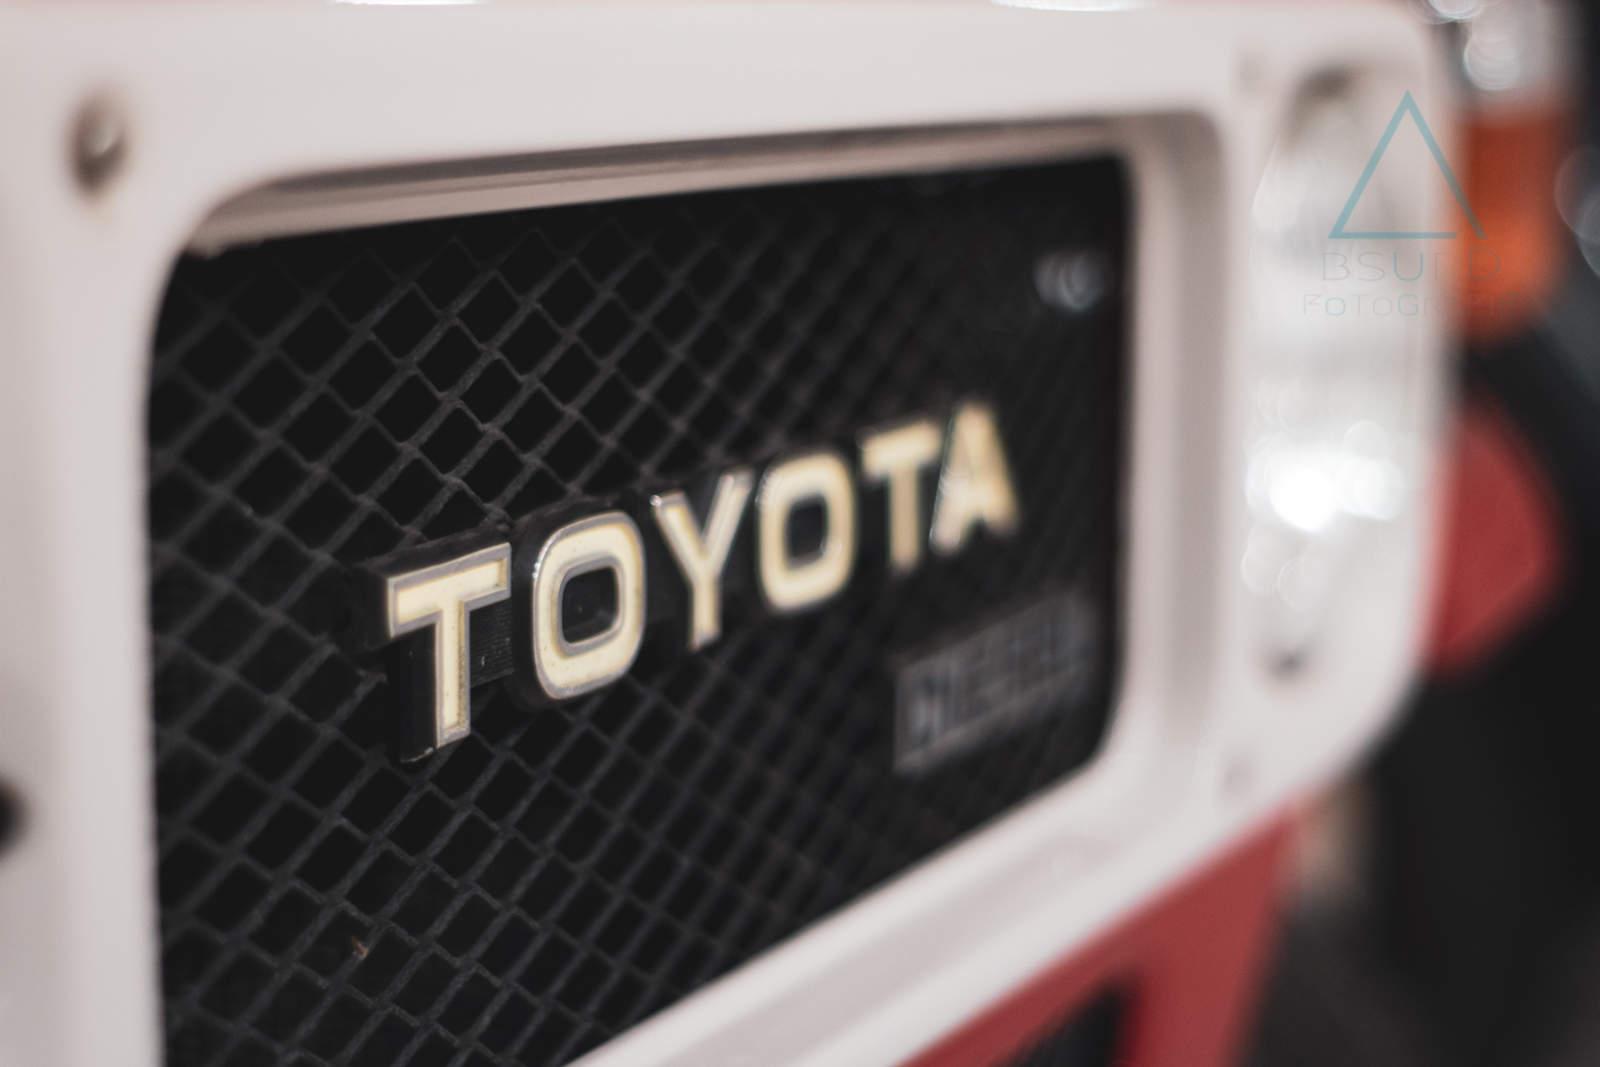 2019-01-05-Toyota-Collection-Koeln - DSC01734-edit-71.jpg